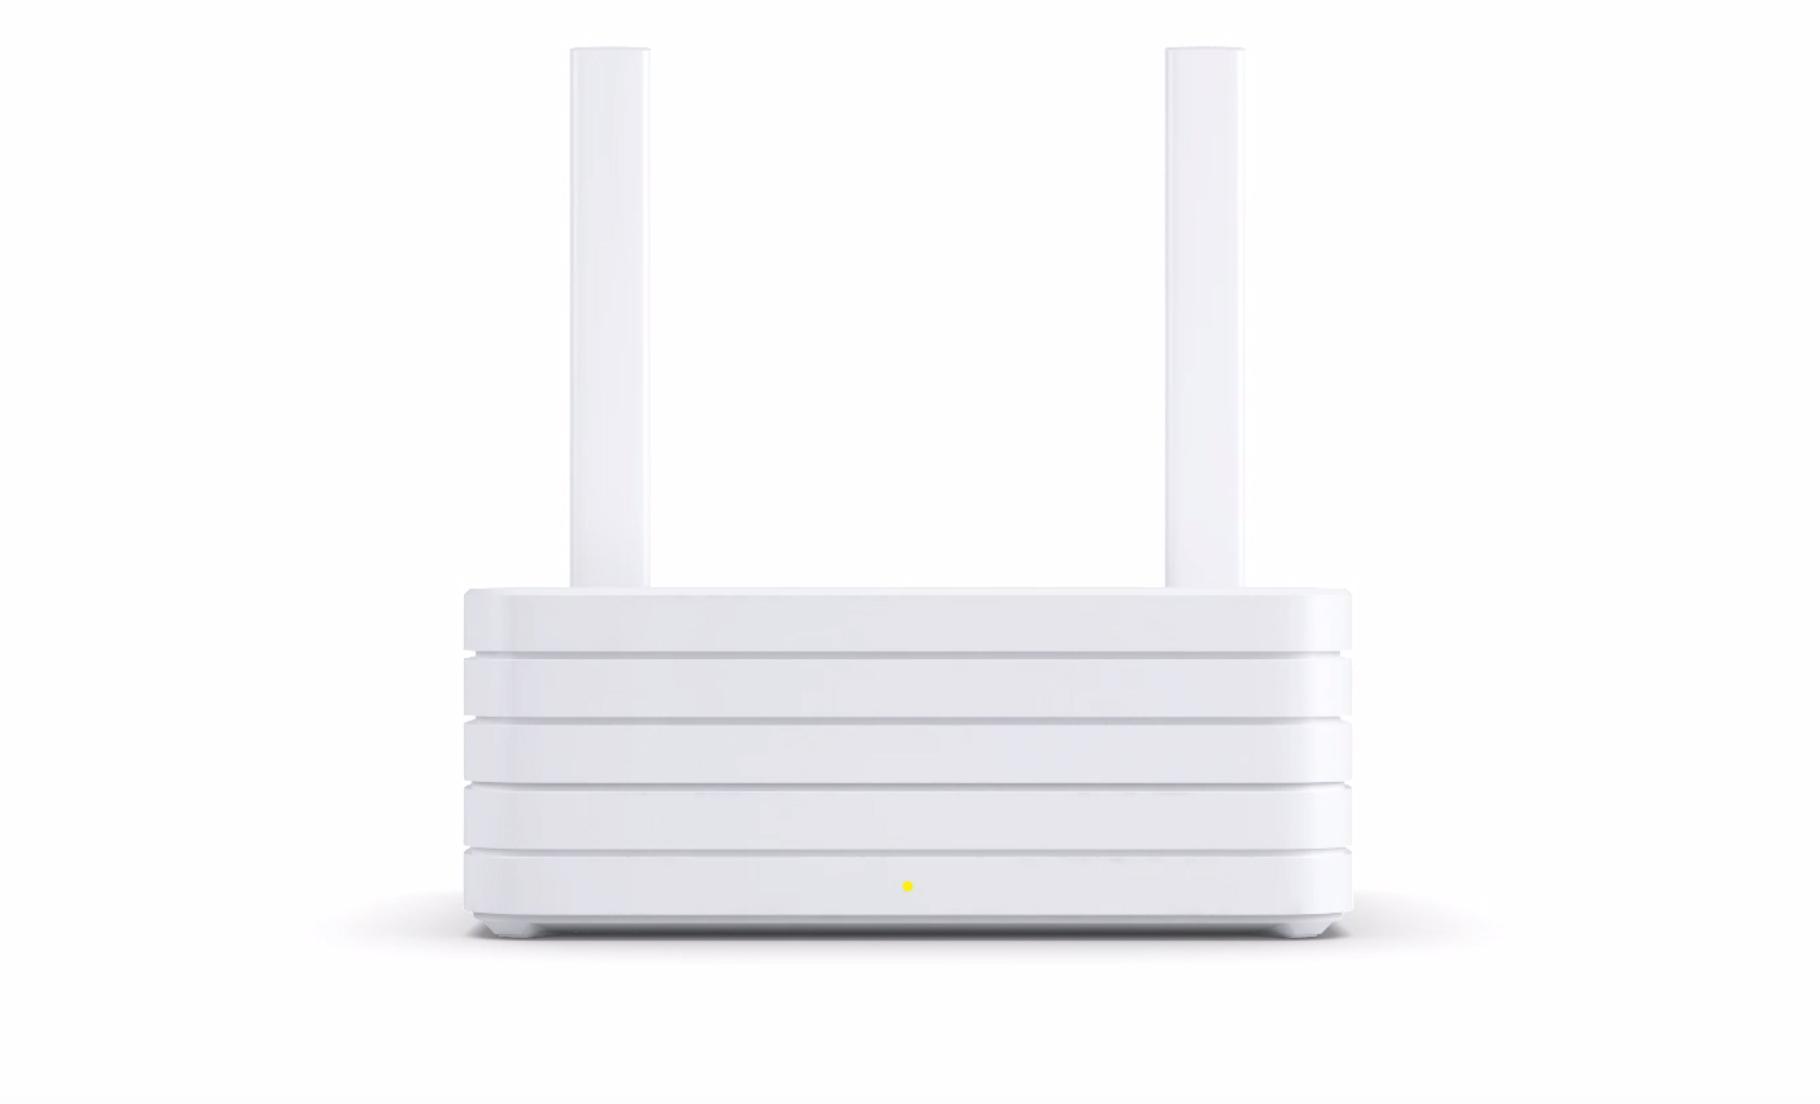 xiaomi-wi-fi-router-na-1-tb